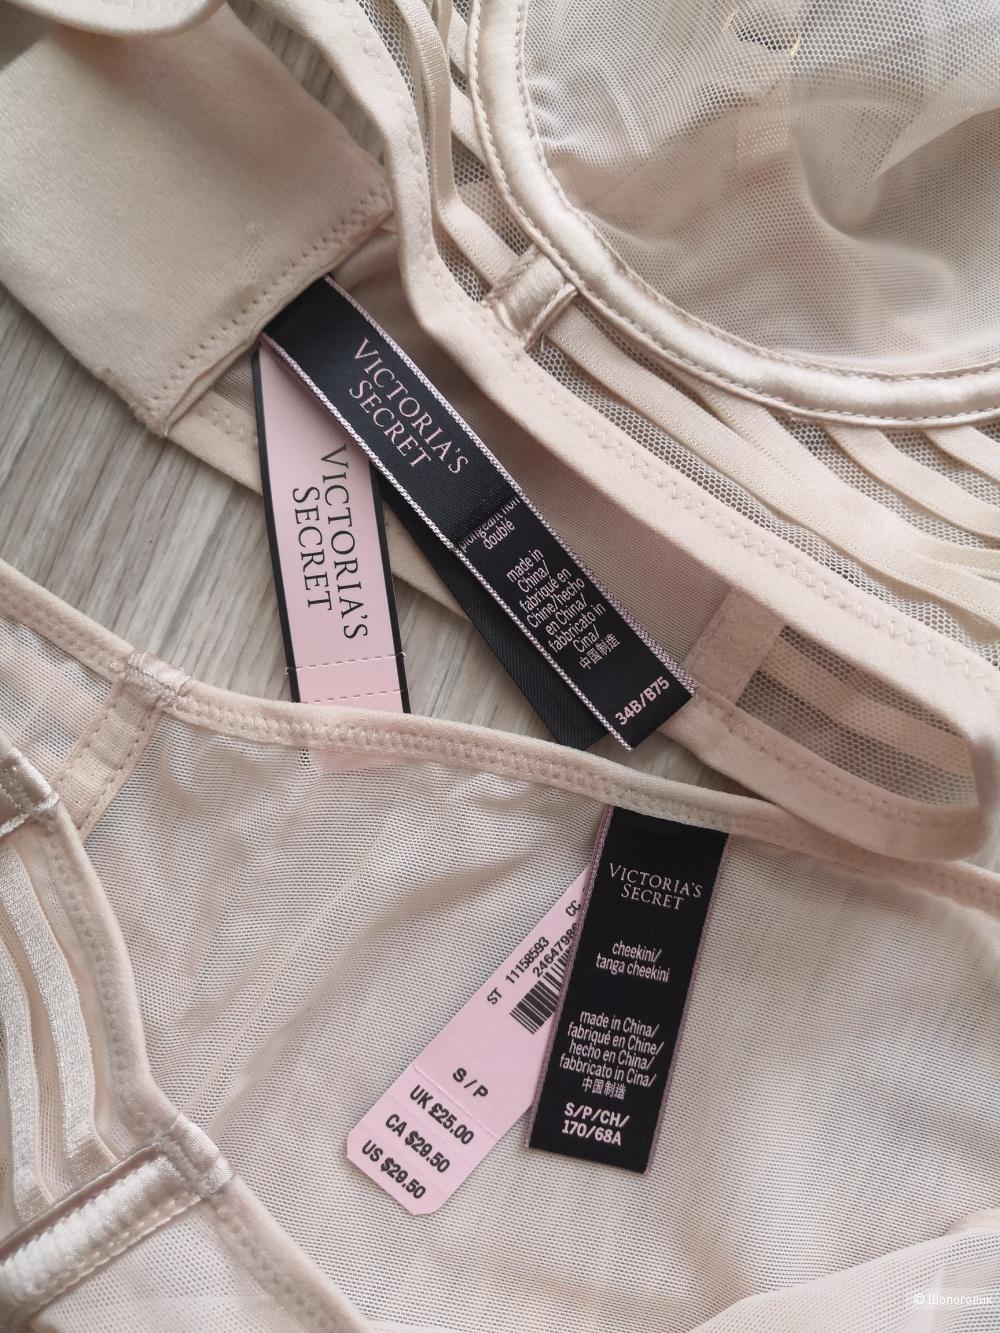 Комплект Victoria's Secret, размер 75В и S.